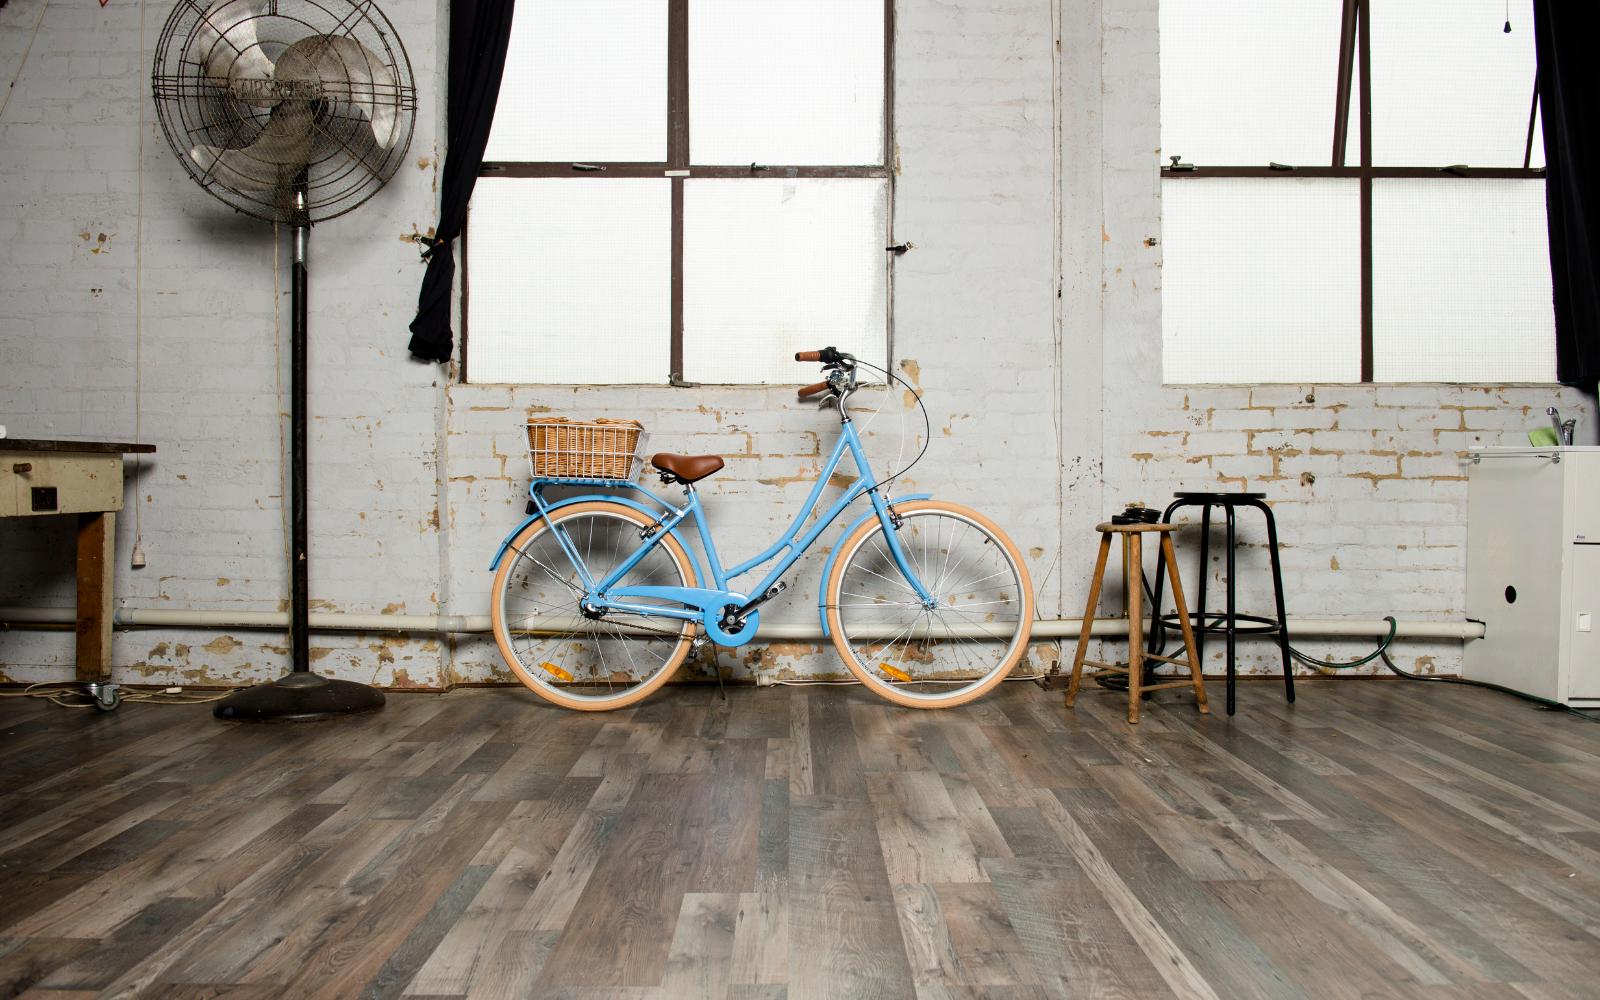 18 14 - Reid ® - Ladies Deluxe 3-Speed Bike